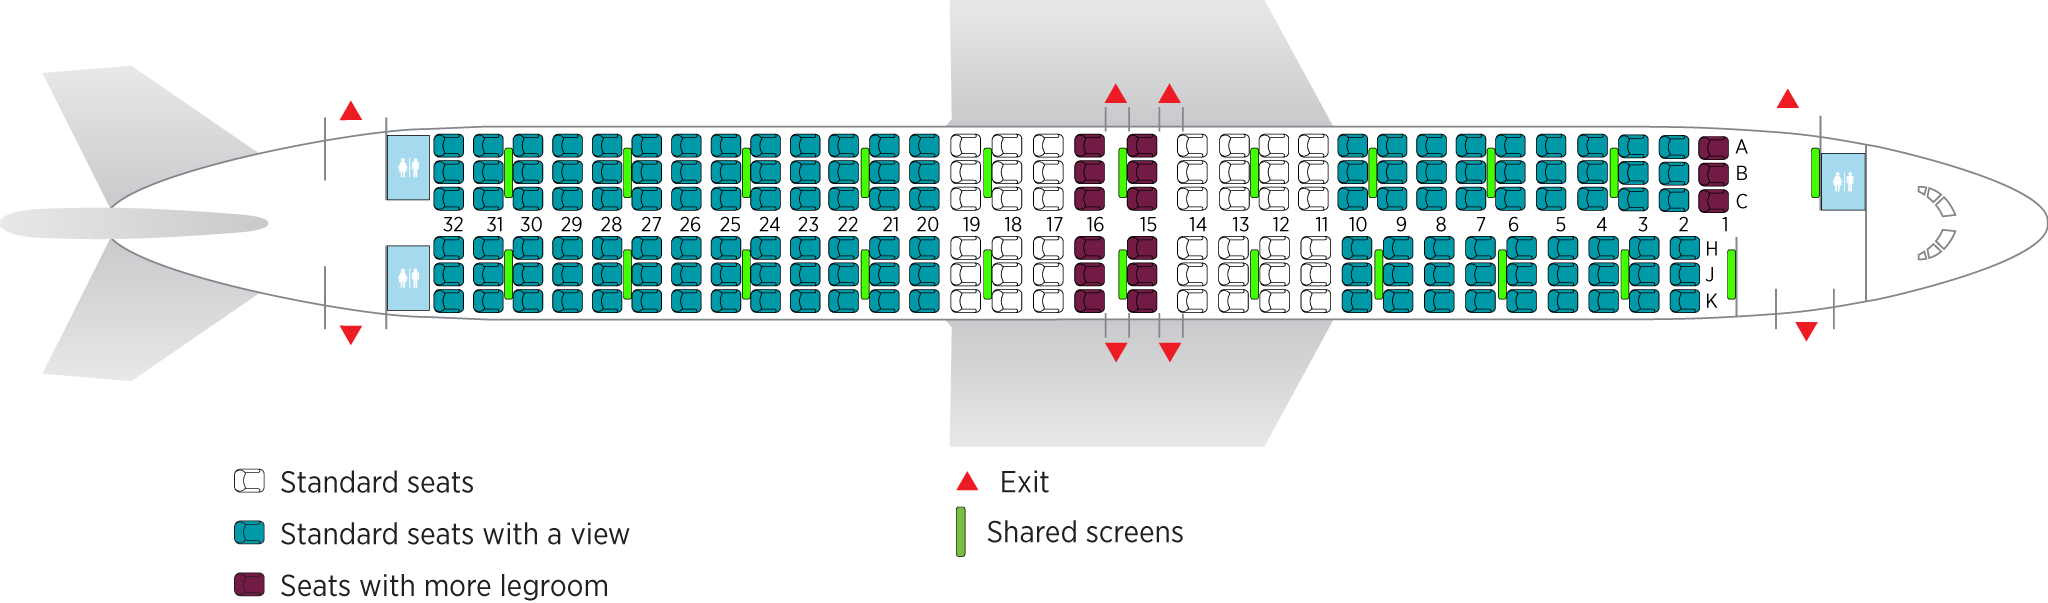 Delta 737 800 Seat Chart Wallseatco